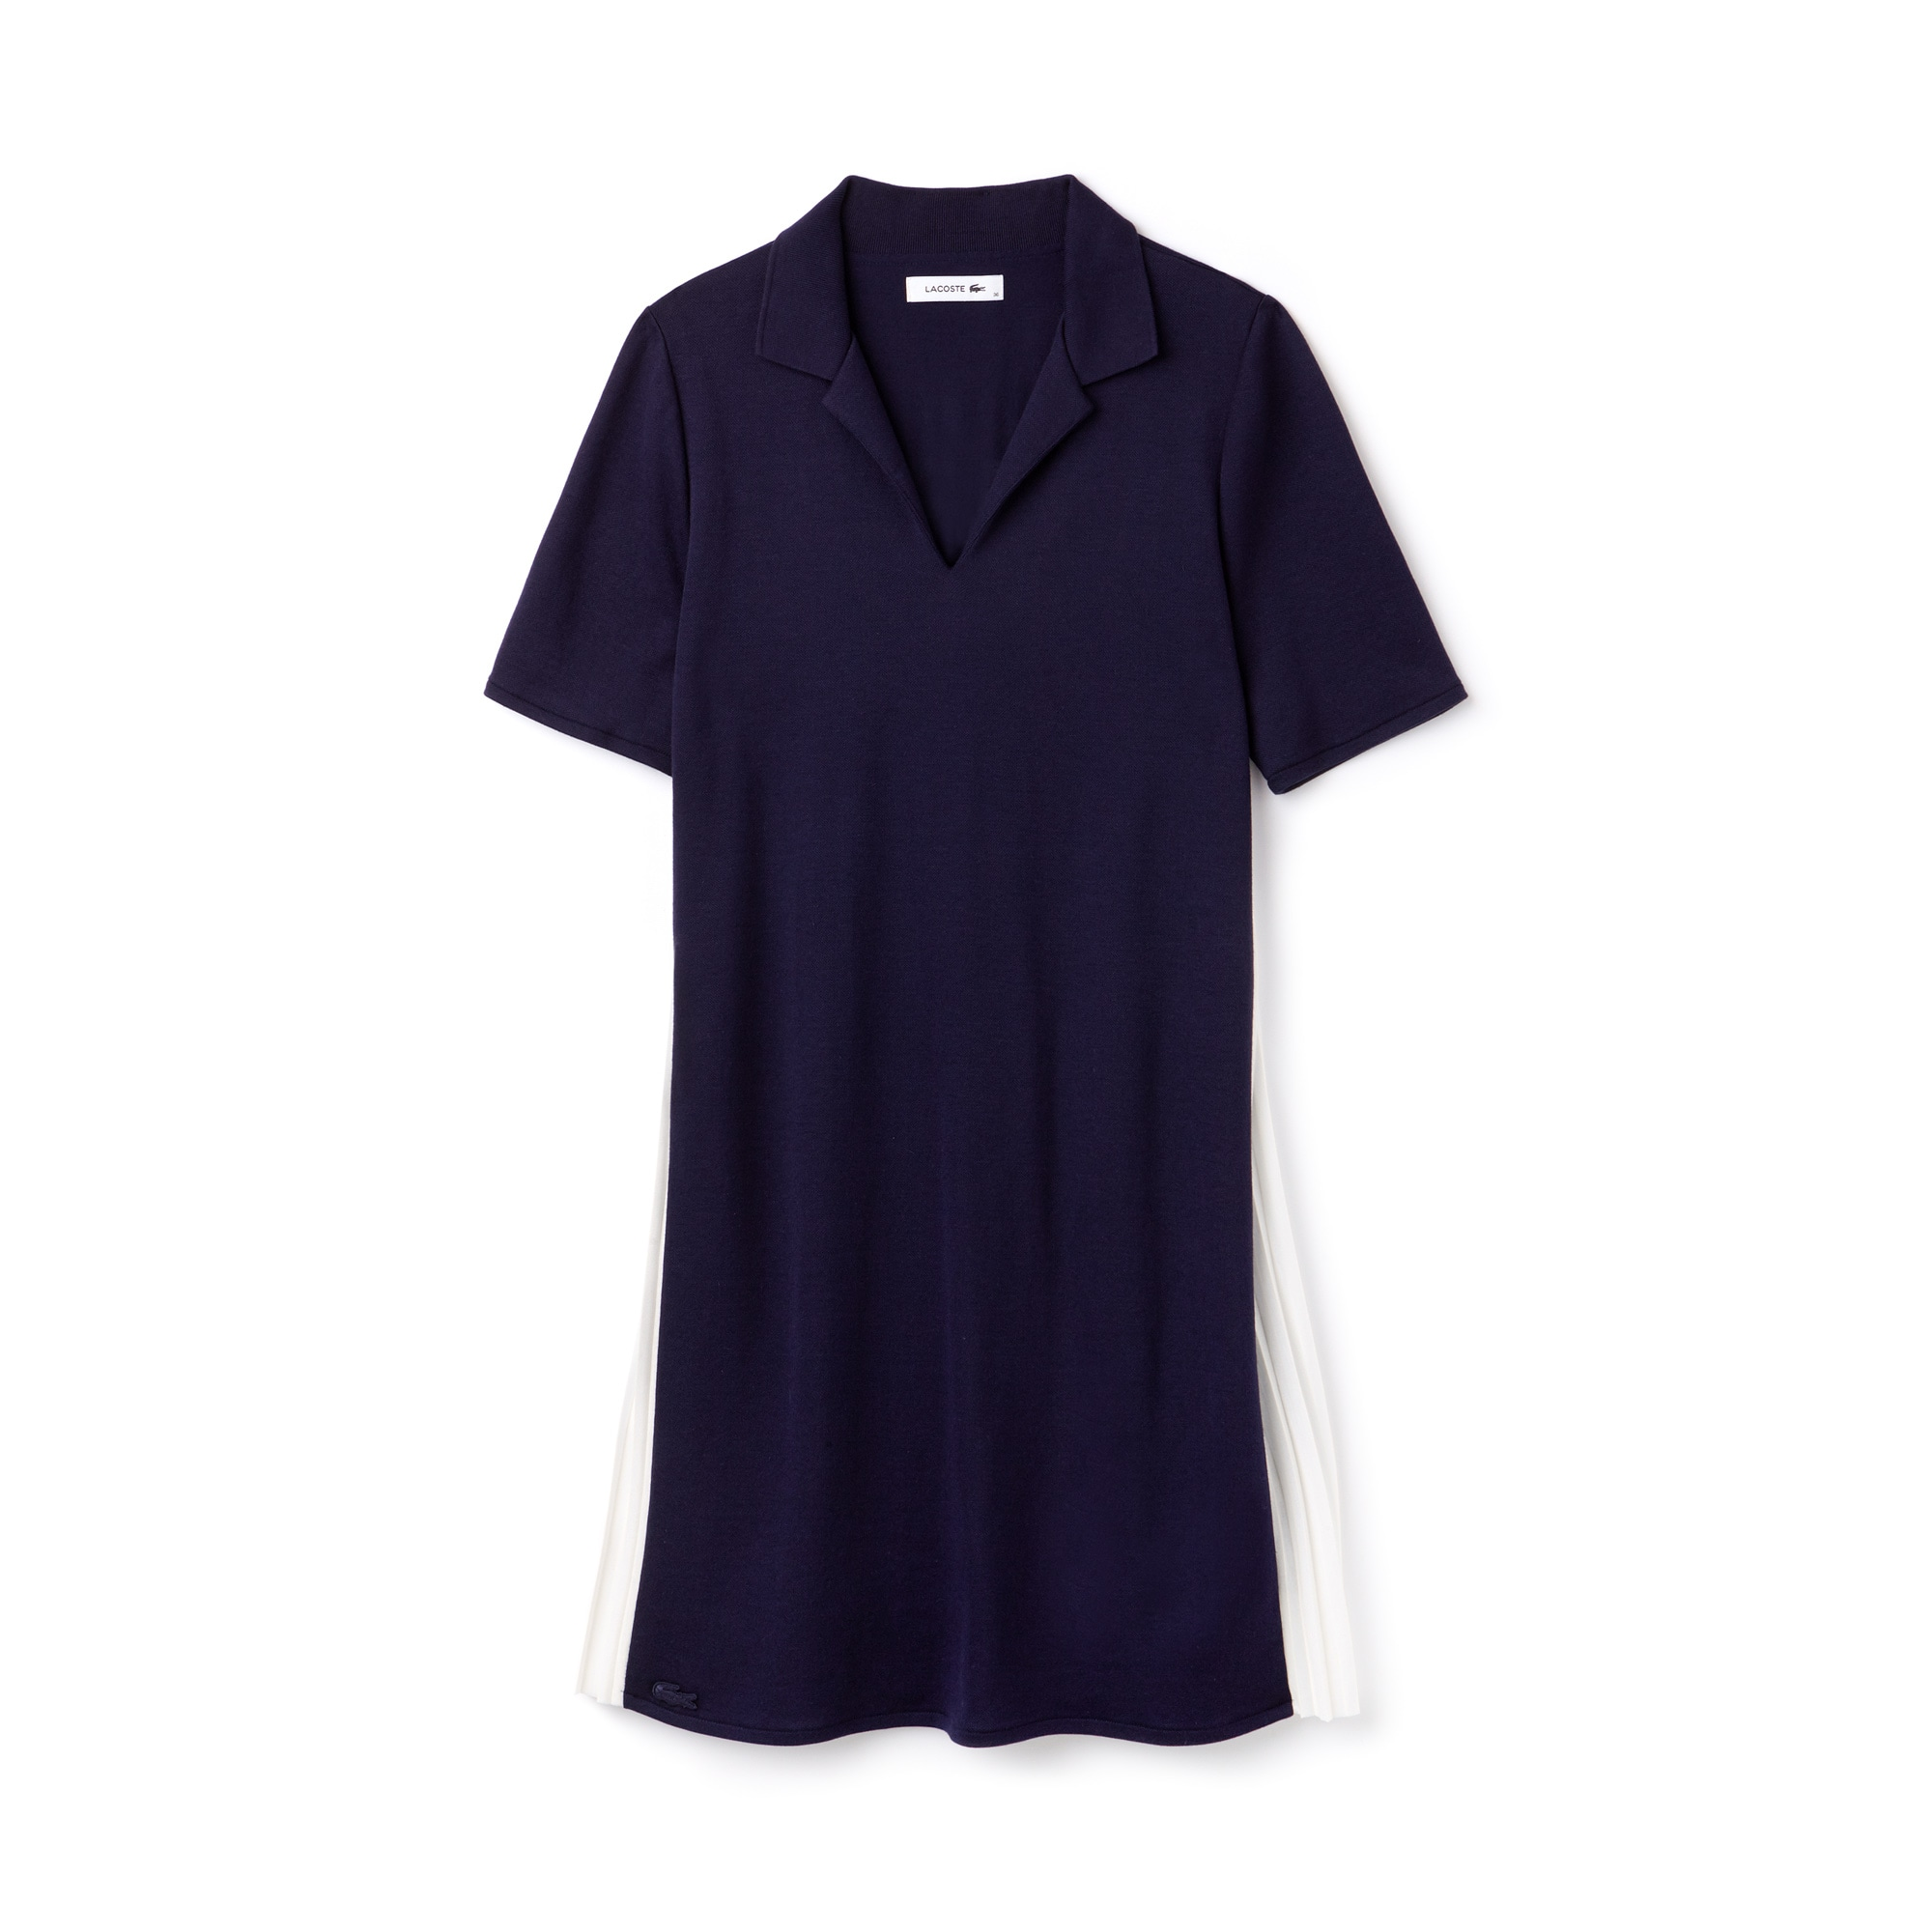 Women's Pleated Panel Piqué Polo Dress